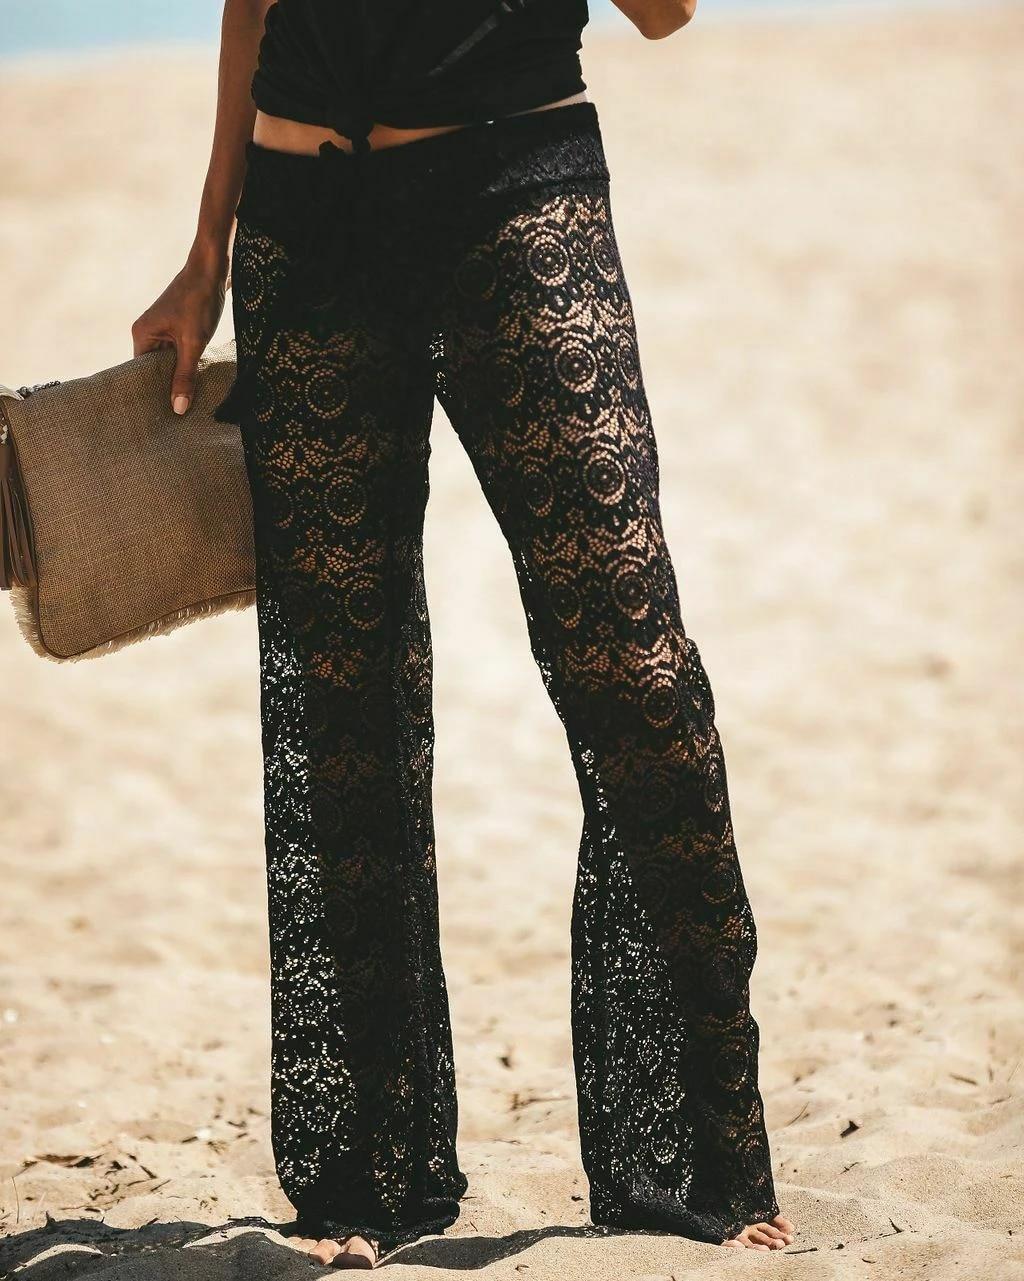 2 Colores Moda Mujer Playa Pantalones Encaje Malla Transparente Low Wist Hollow Out Solid Crochet Cover Up Pants Lounge Pants Verano Pantalones Y Pantalones Capri Aliexpress